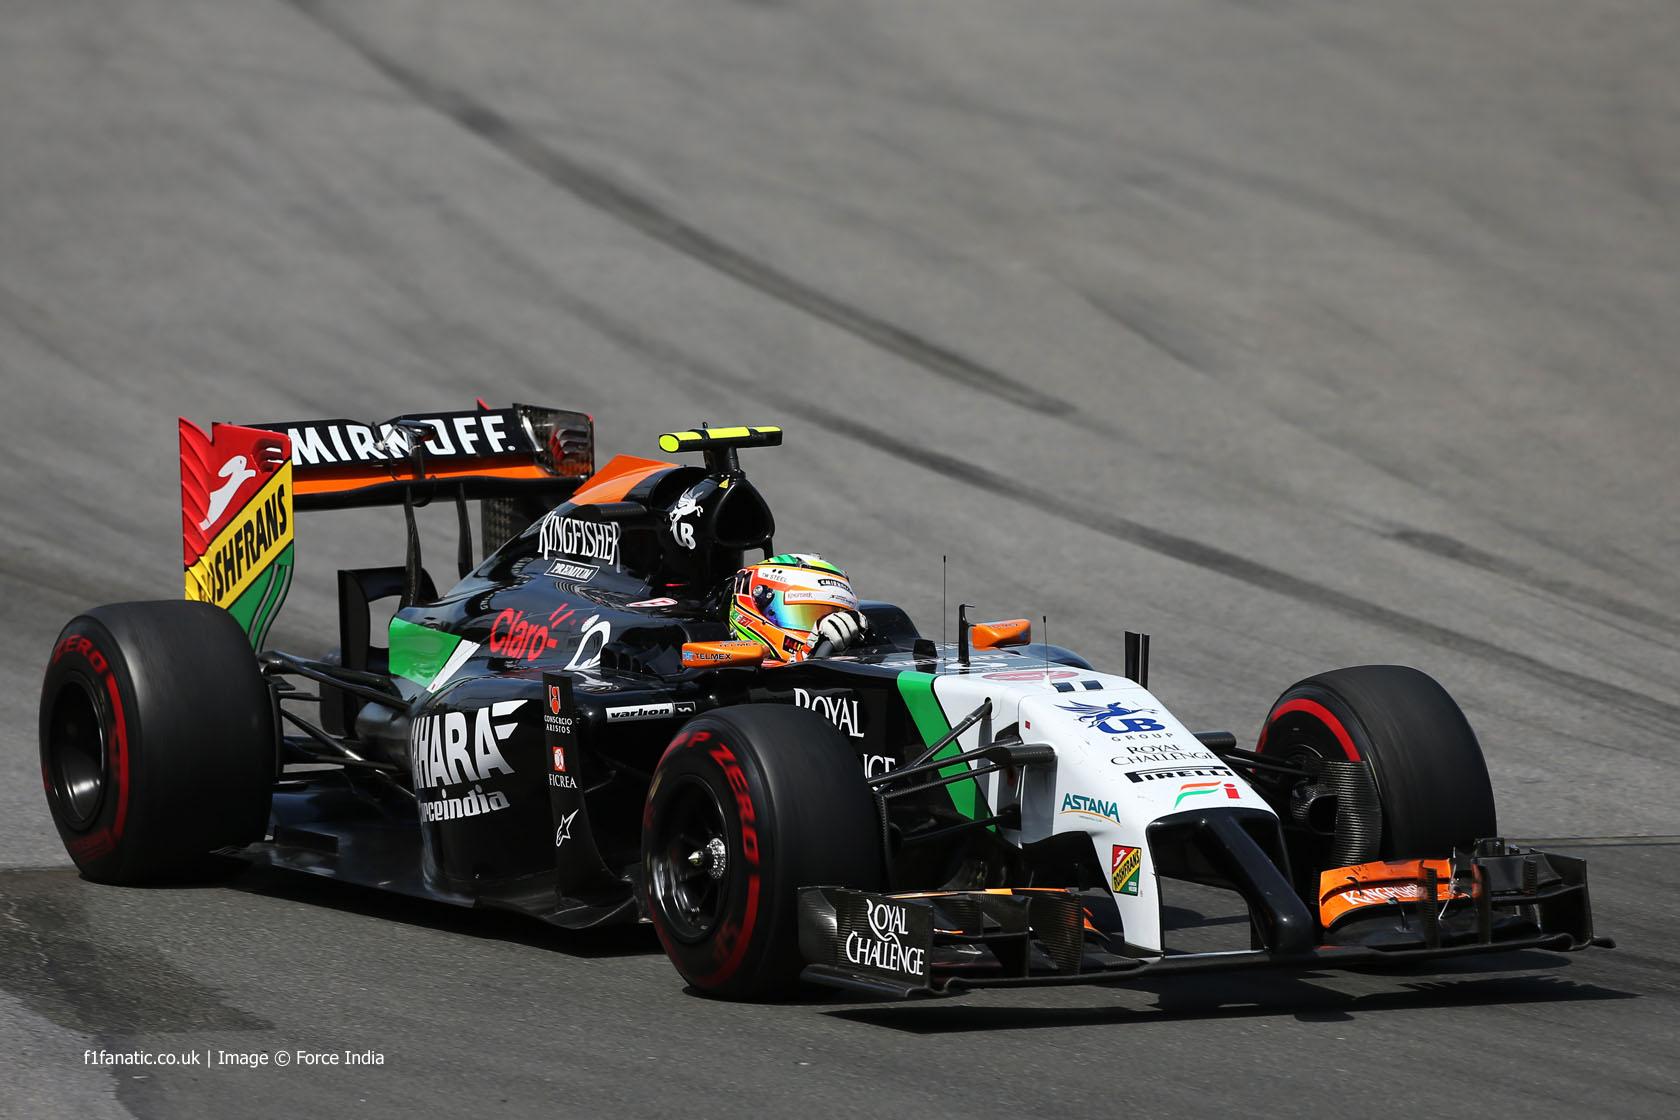 Perez penalised for last-lap crash with Massa